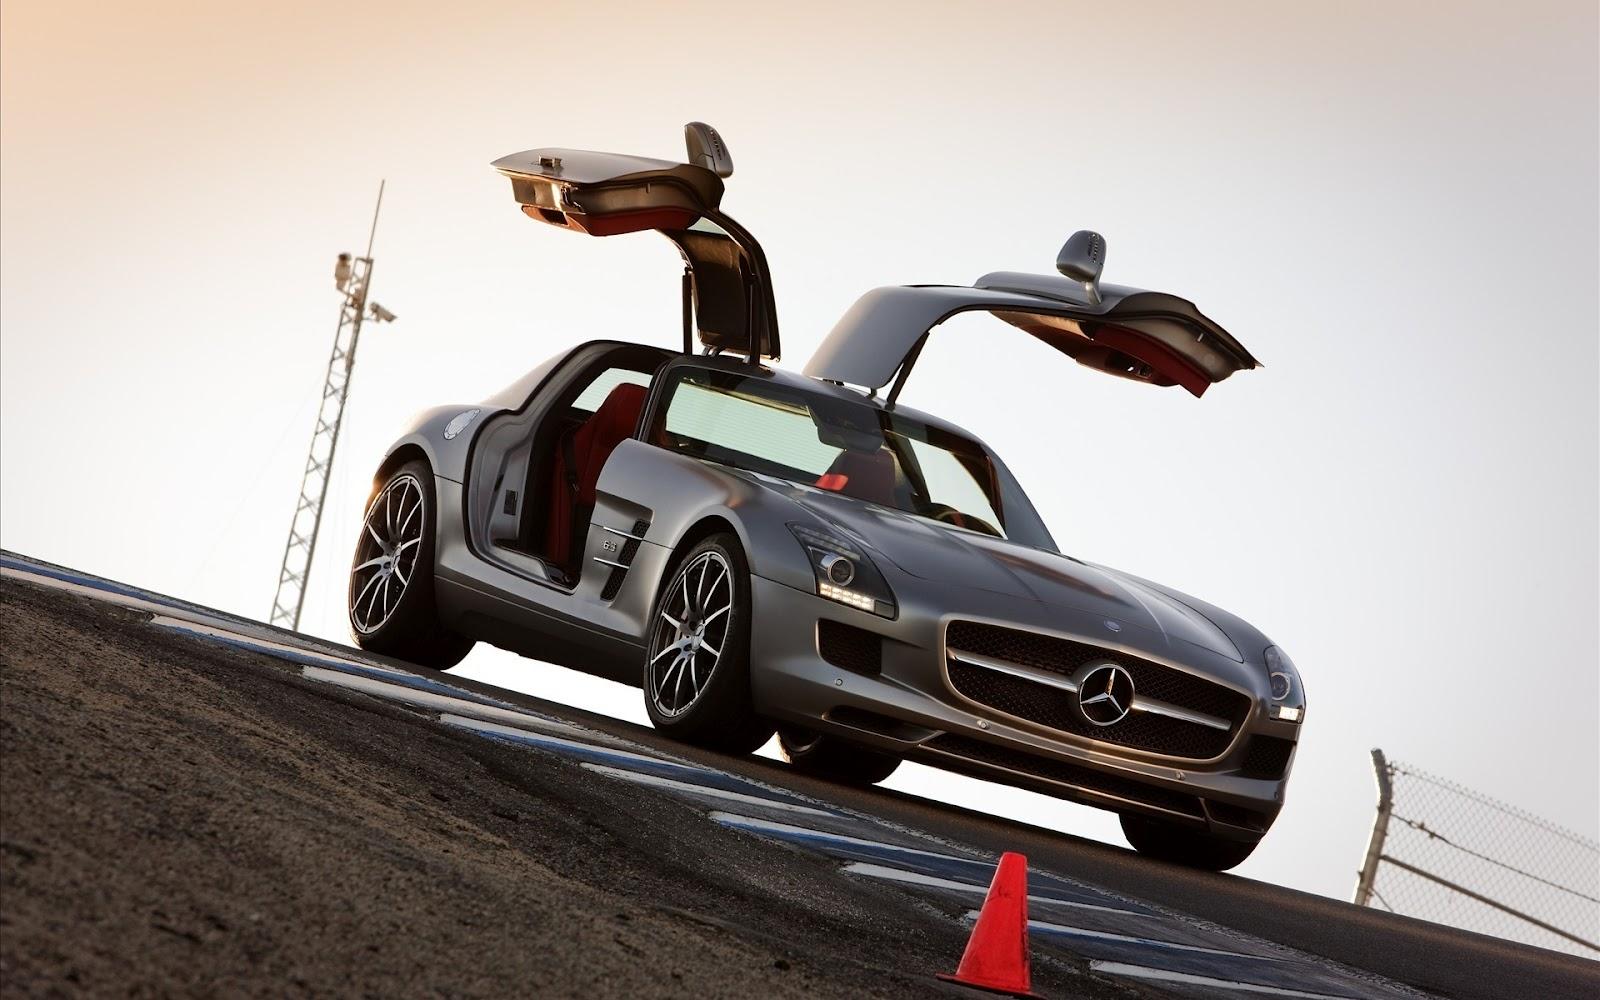 http://2.bp.blogspot.com/-ew3ENWLfcho/T51y4YAVG8I/AAAAAAAAbI4/Hm9p_6R3kNc/s1600/Mercedes-Benz-AMG-SLS_01.jpg